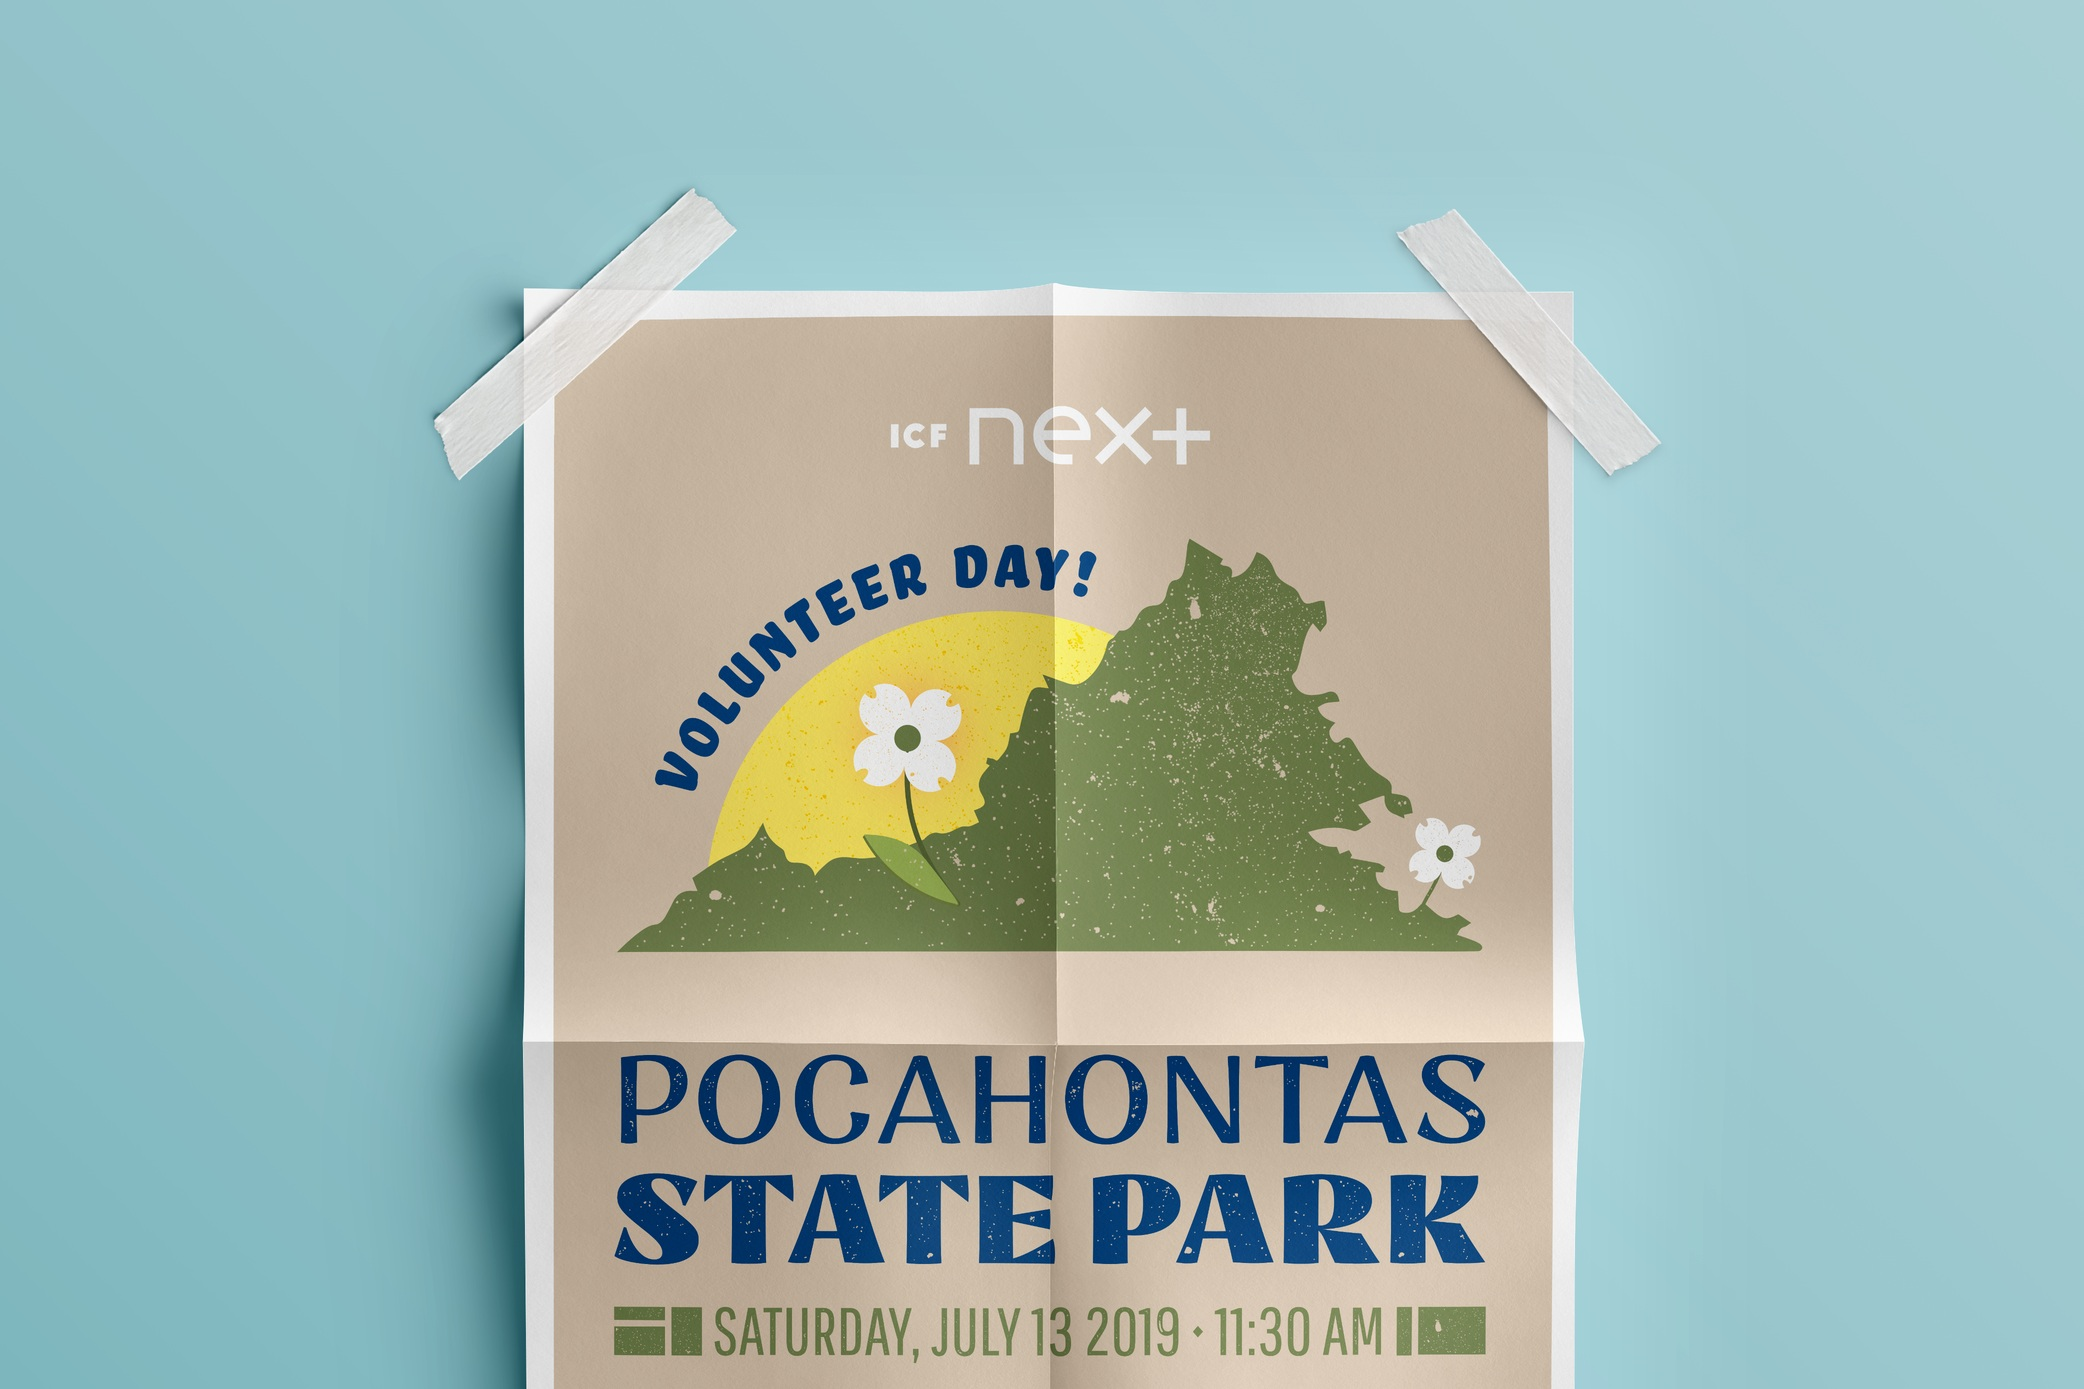 Pocahontas_Poster.jpg